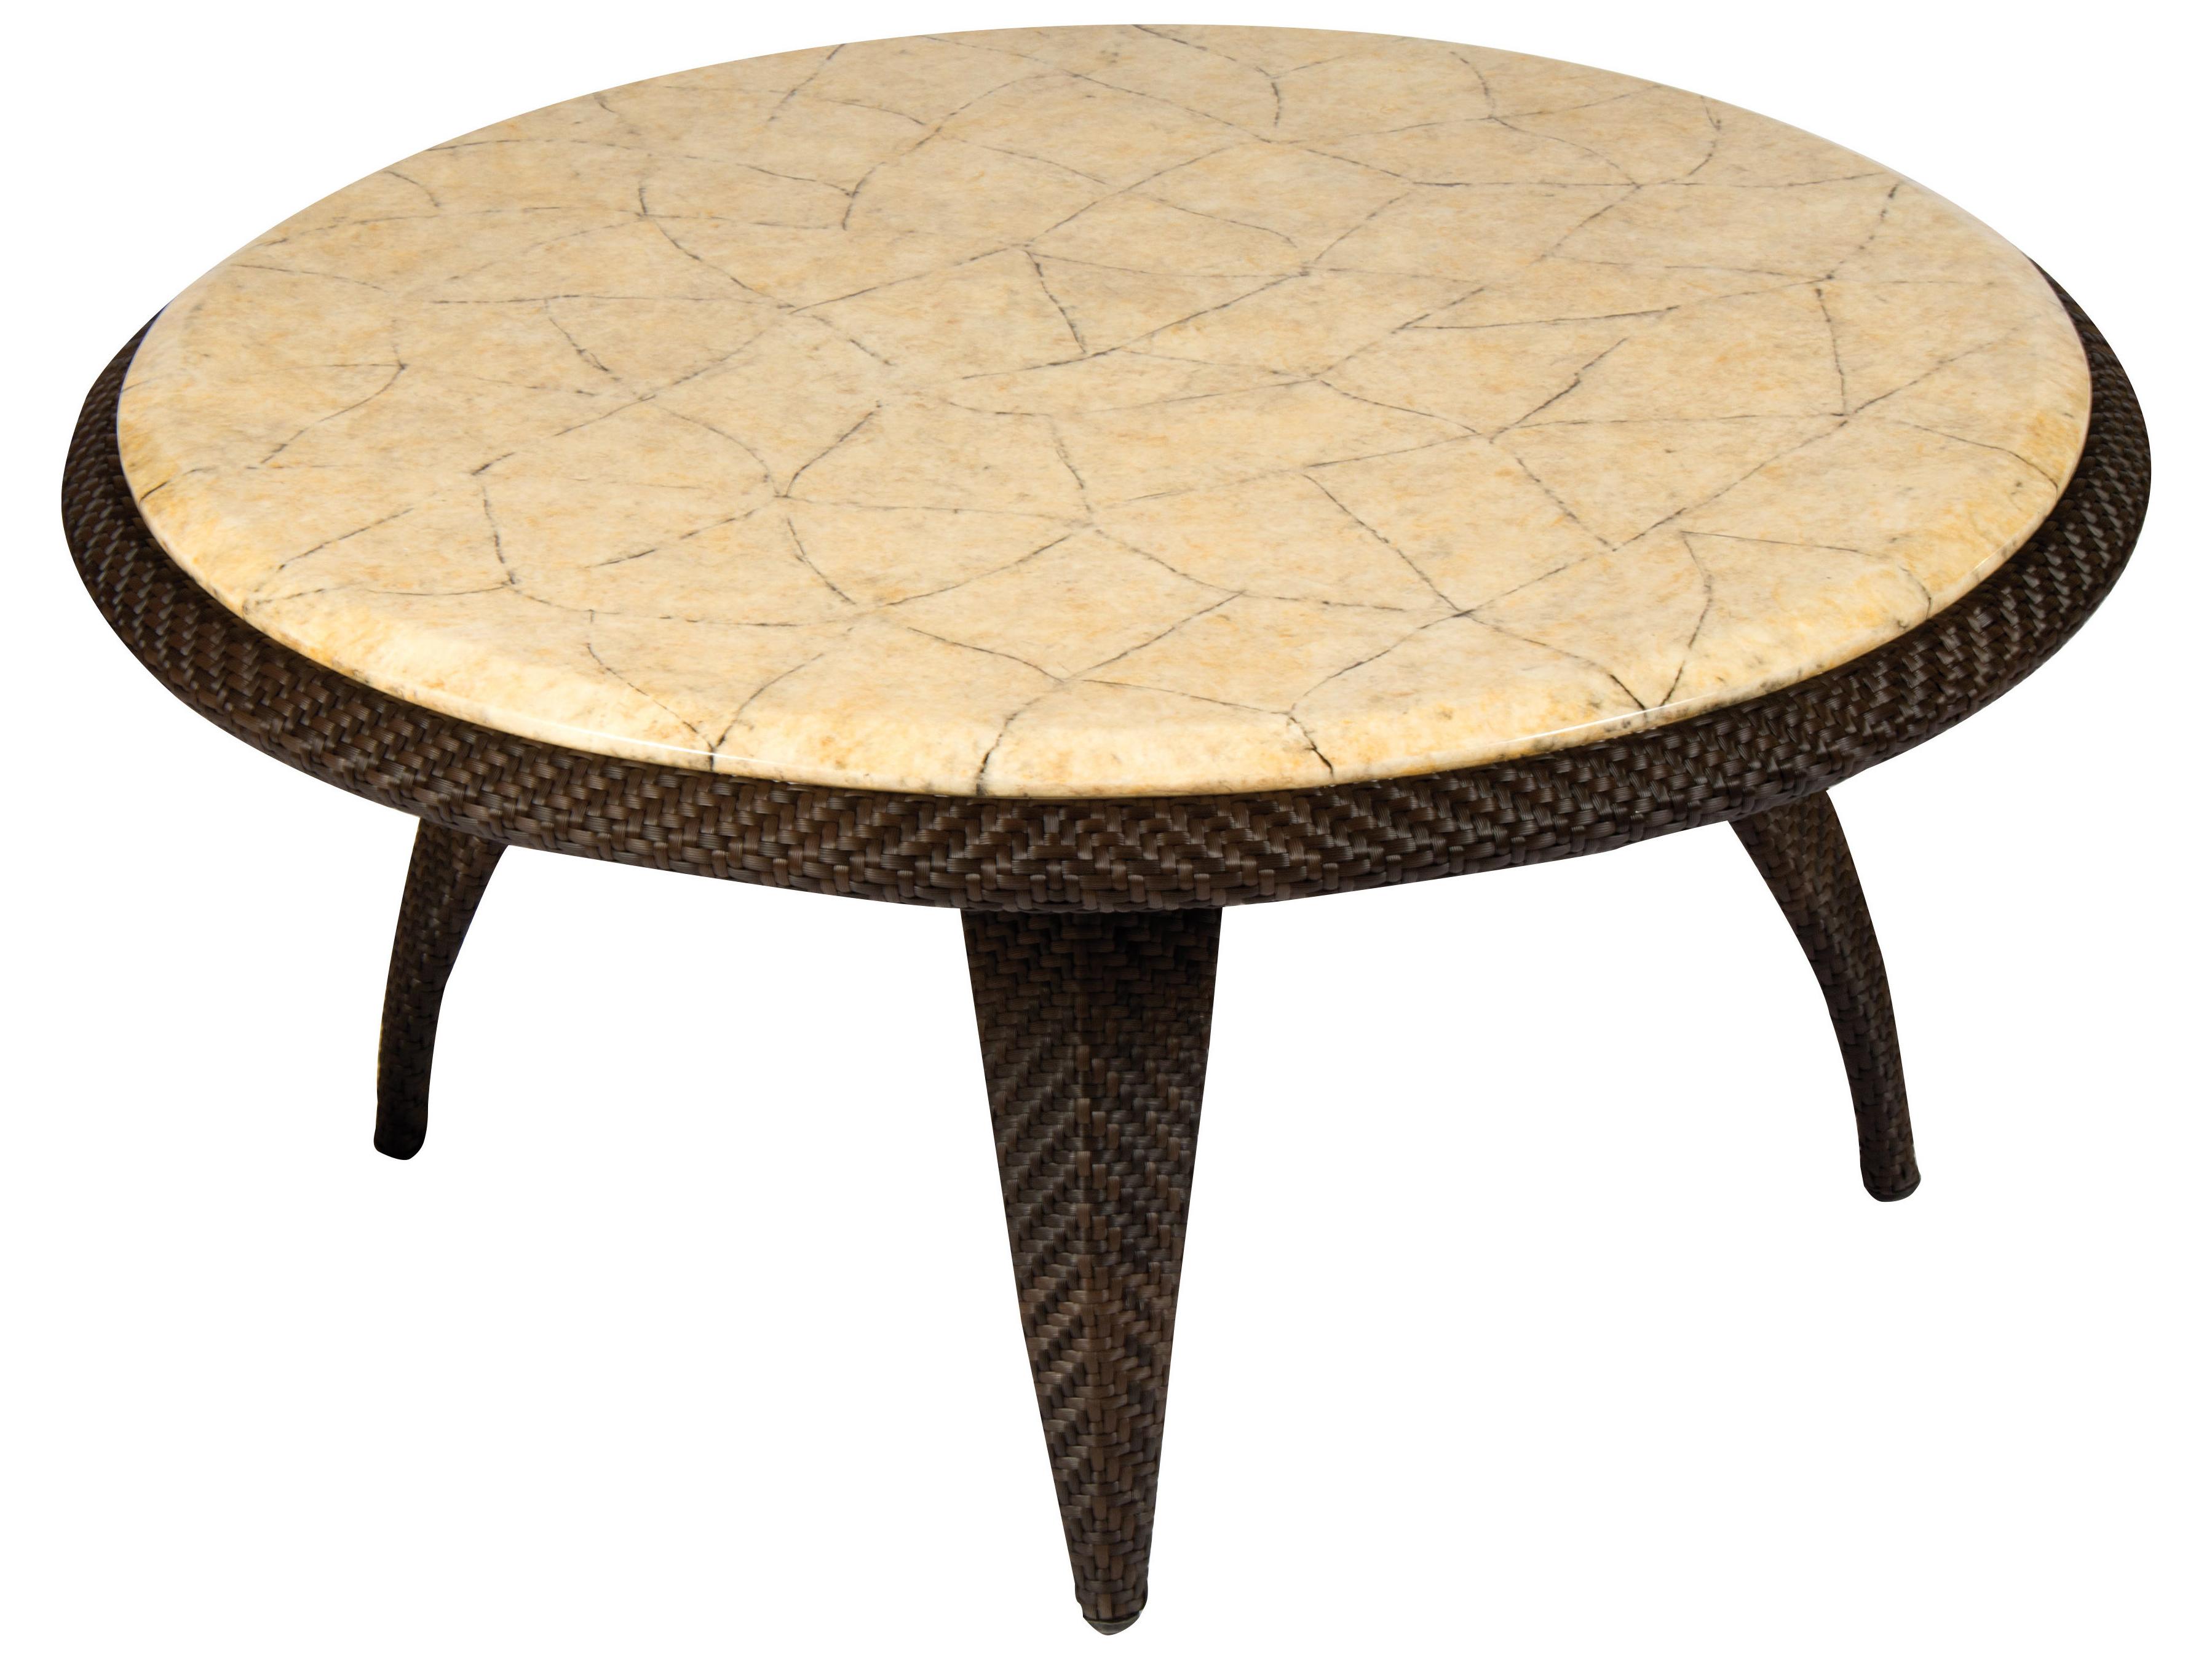 Trendy Stone Top Coffee Tables Regarding Whitecraft Bali Wicker 40 Round Stone Top Coffee Table (View 19 of 20)